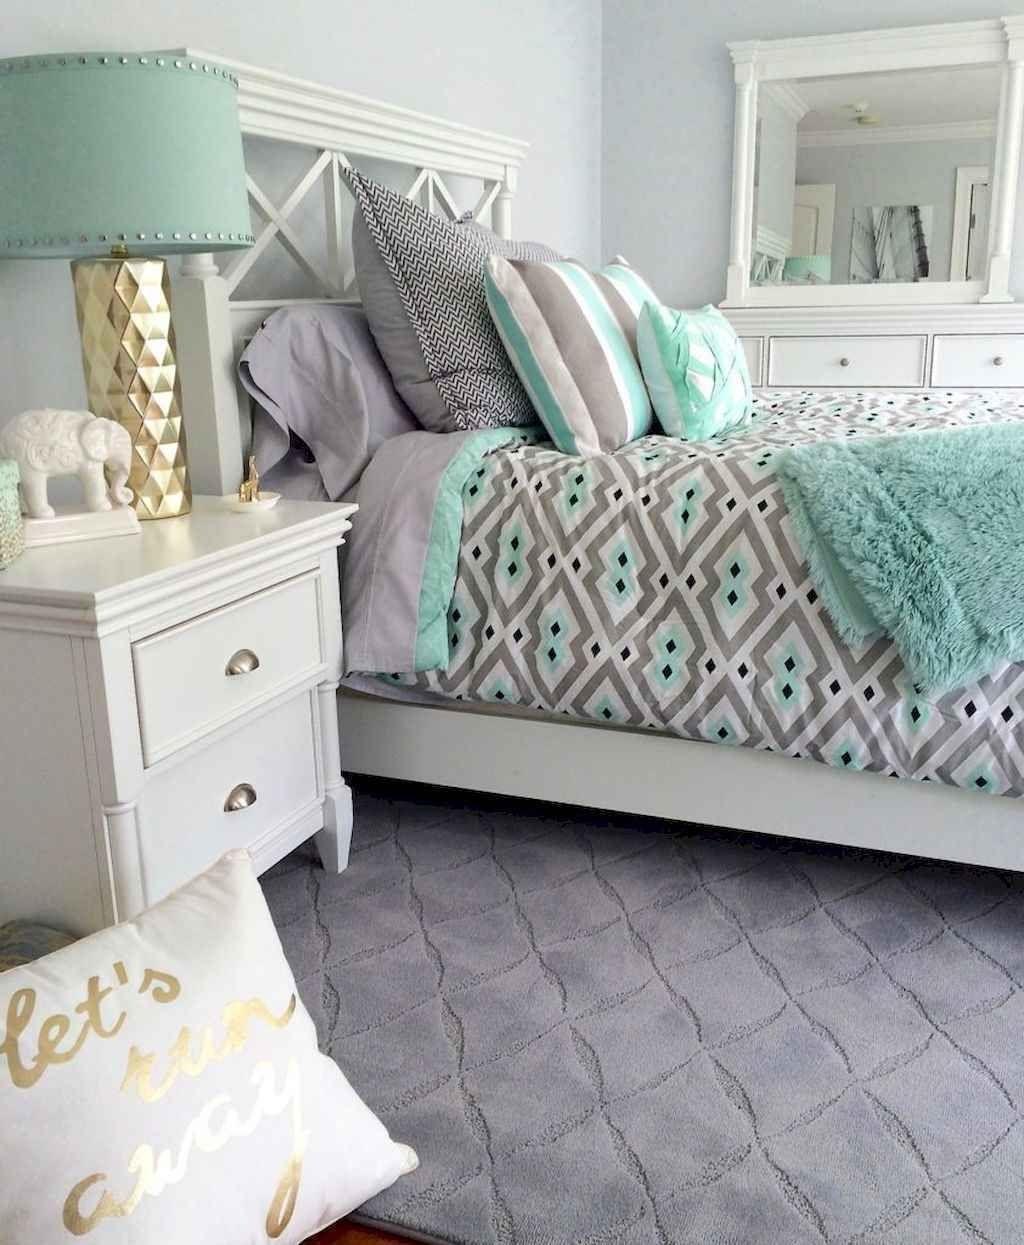 30 Amazing College Apartment Bedroom Decor Ideas and Remodel apartment #30 #amazing #college #apartment #bedroom #decor #ideas #and #remodel